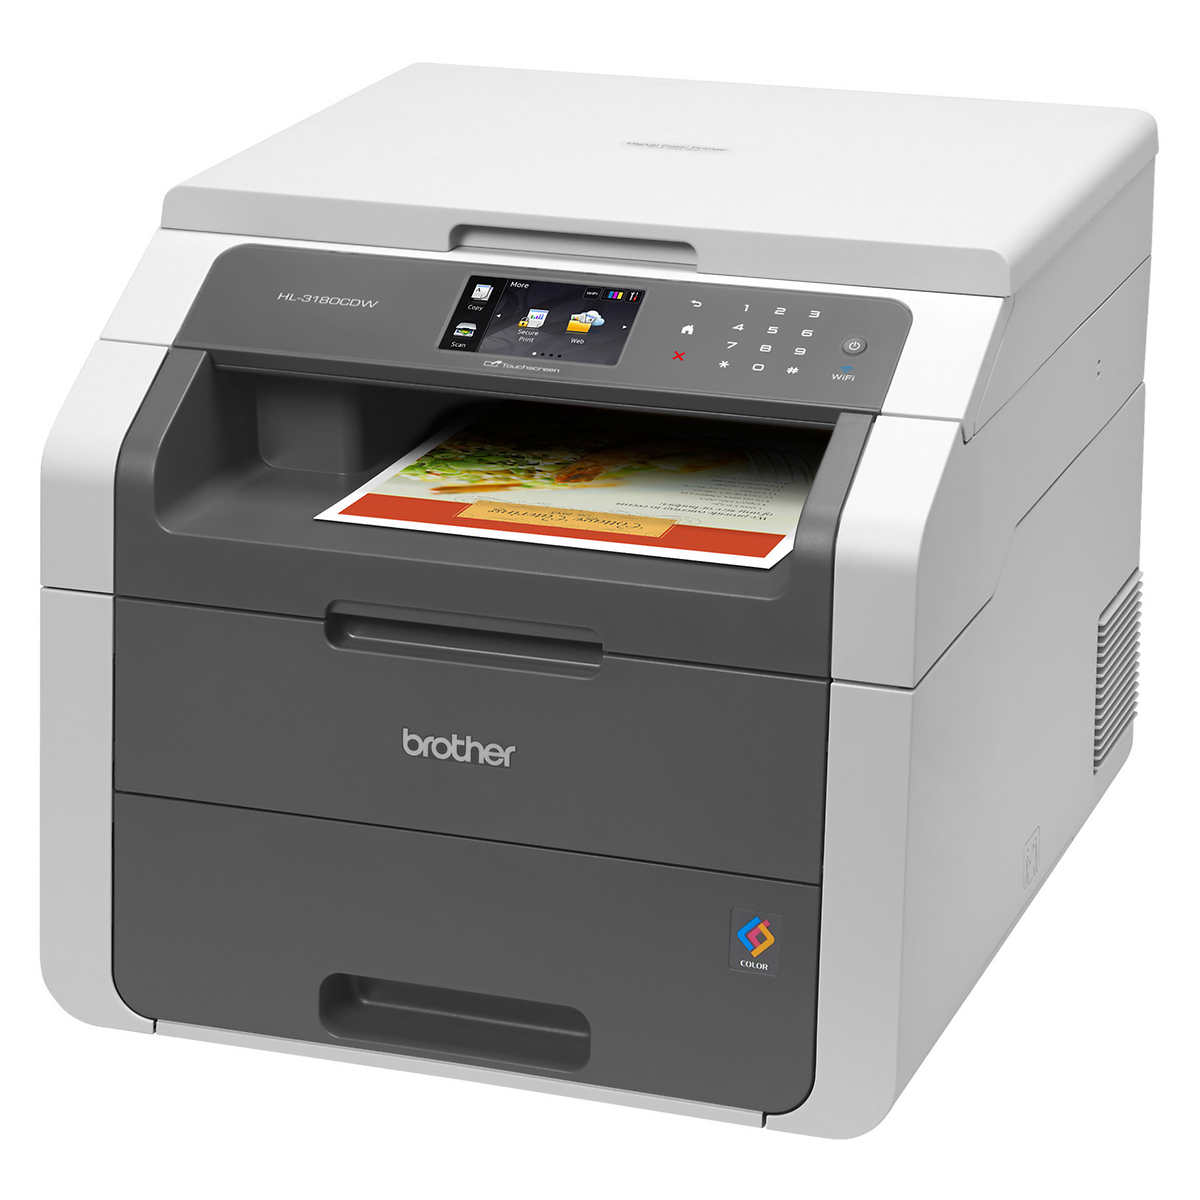 Printer not printing color hp - Member Only Item